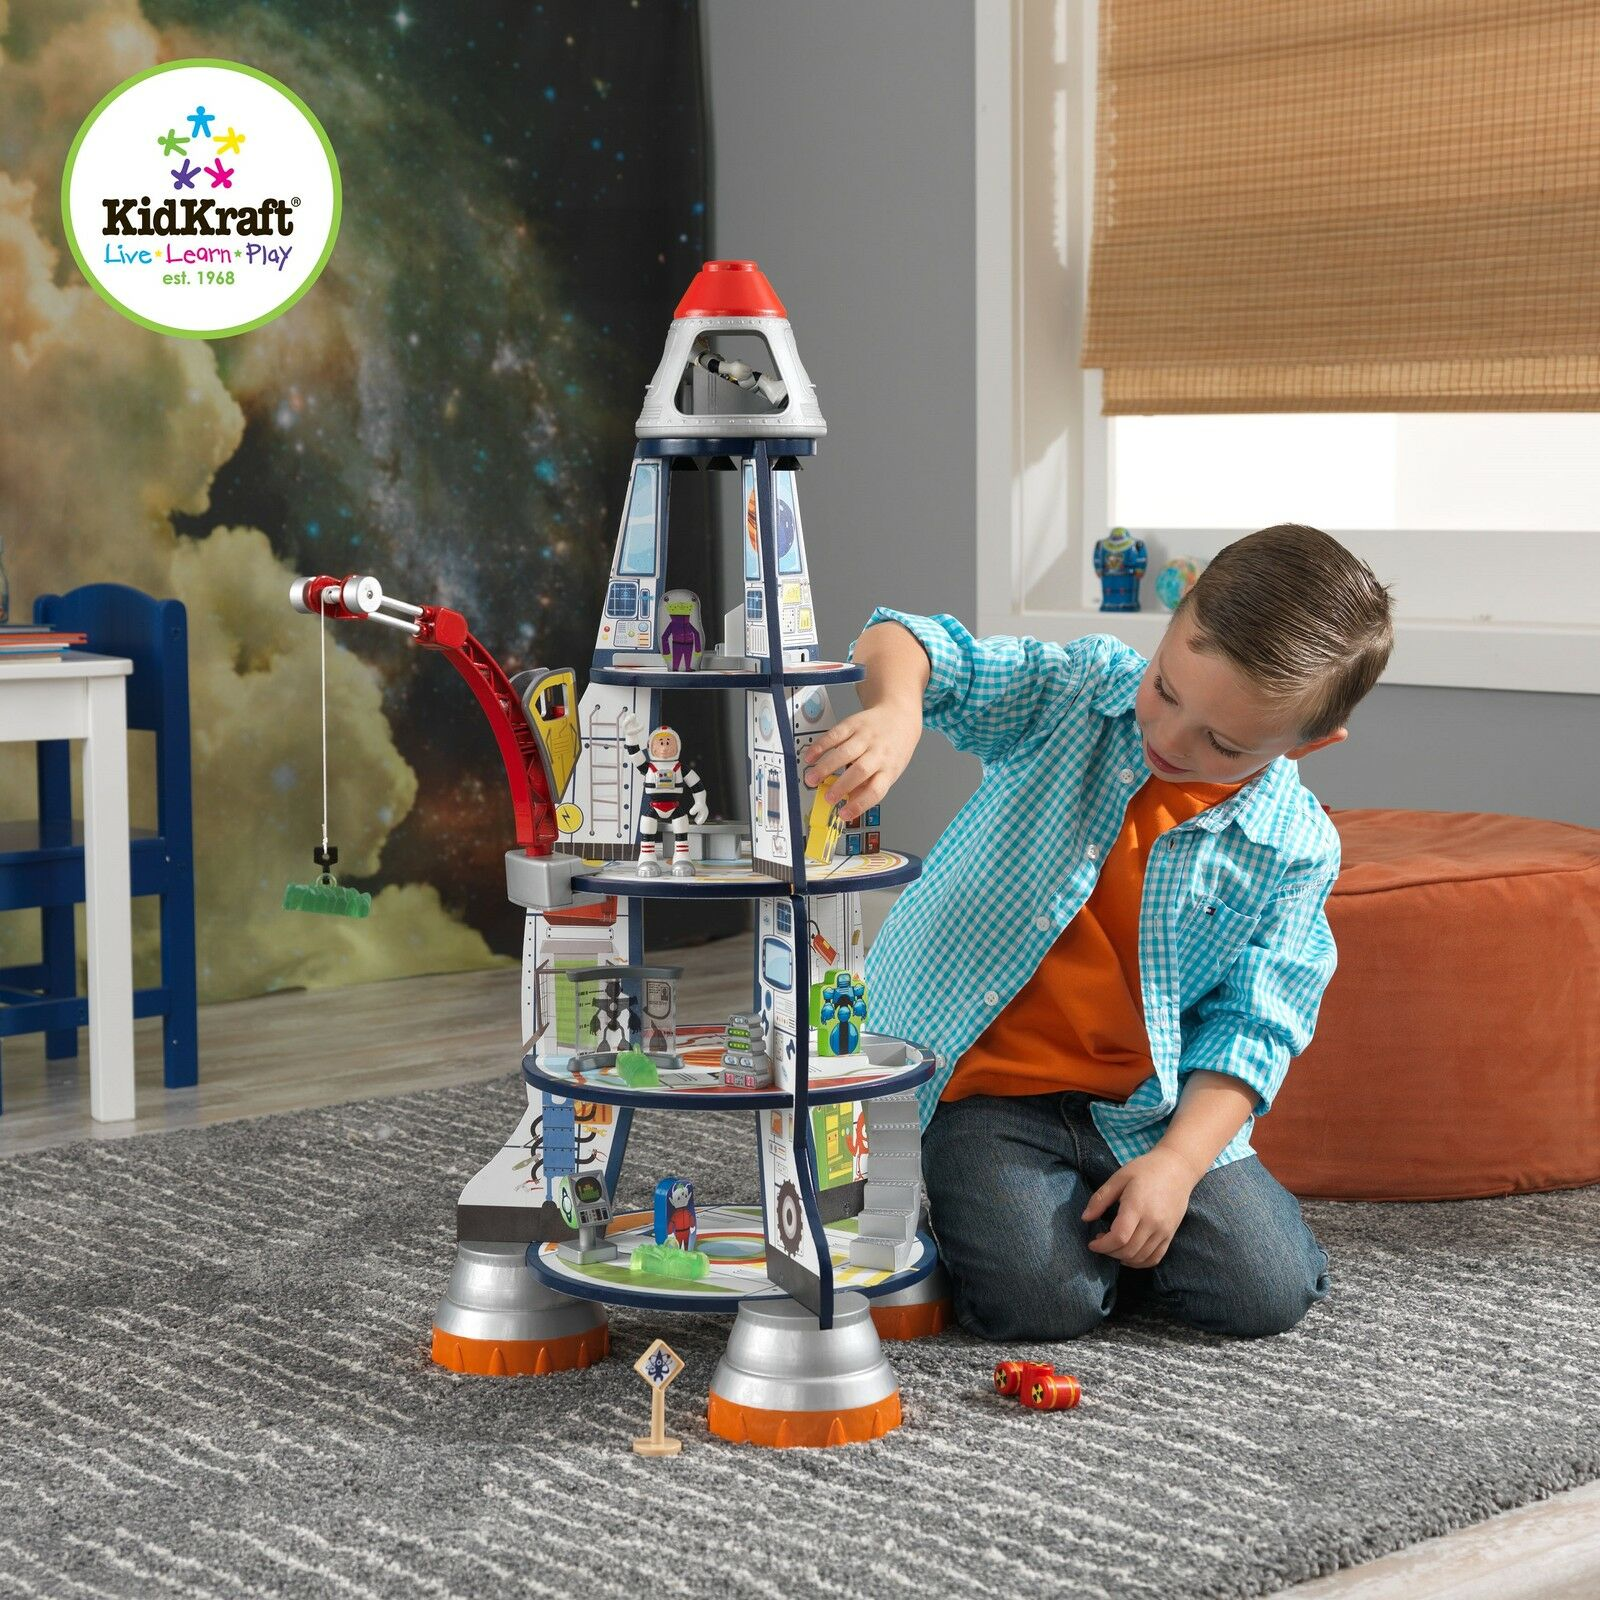 Kidkraft Madera Cohete Espacial Barco Infantil Nave Nave Nave Espacial Woooden Juguete  mejor vendido